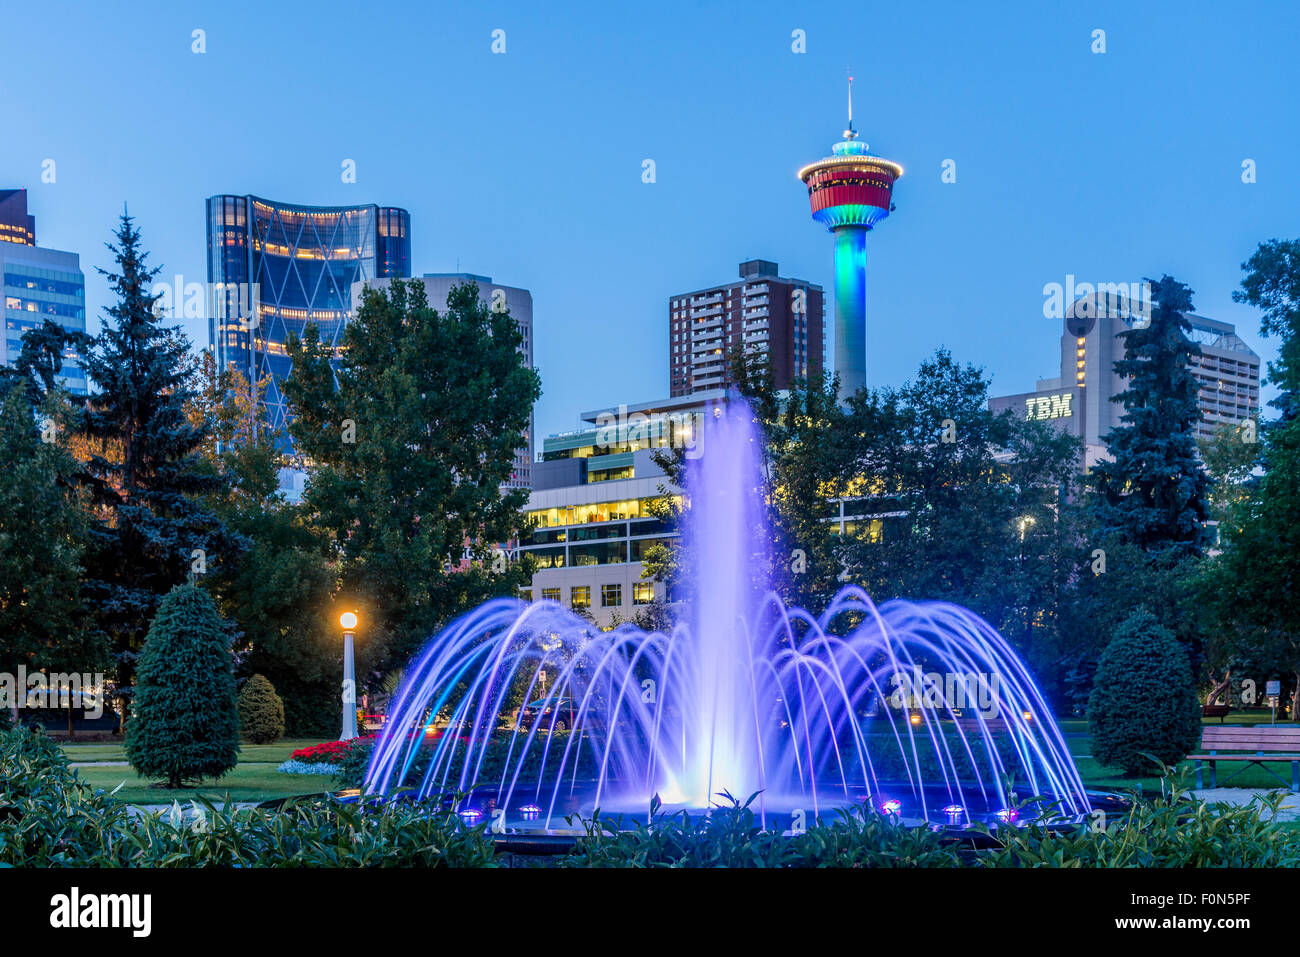 Water fountains calgary - Illuminated Fountain Central Memorial Park Calgary Alberta Canada Stock Image